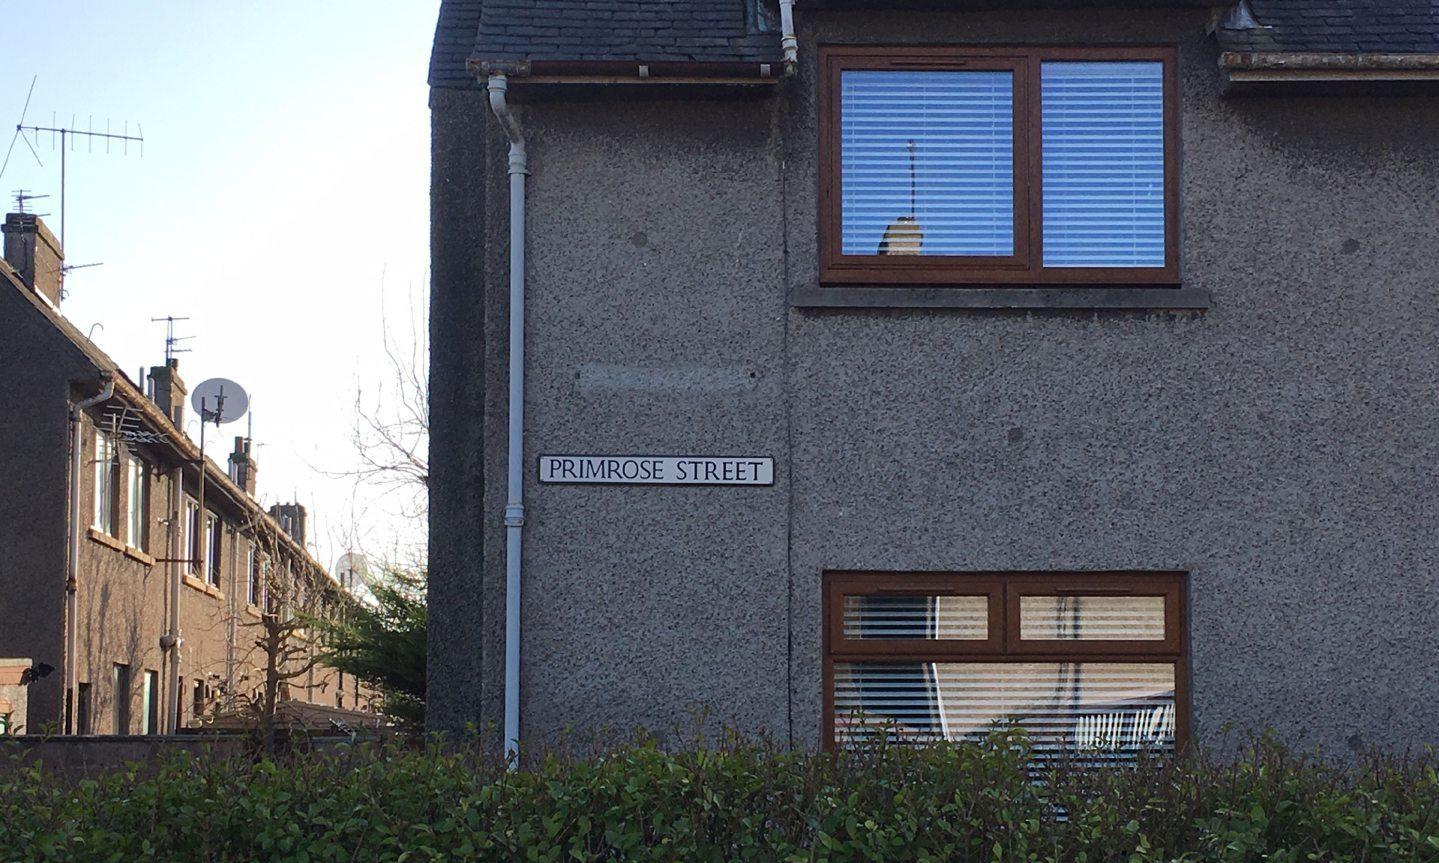 Primrose Street